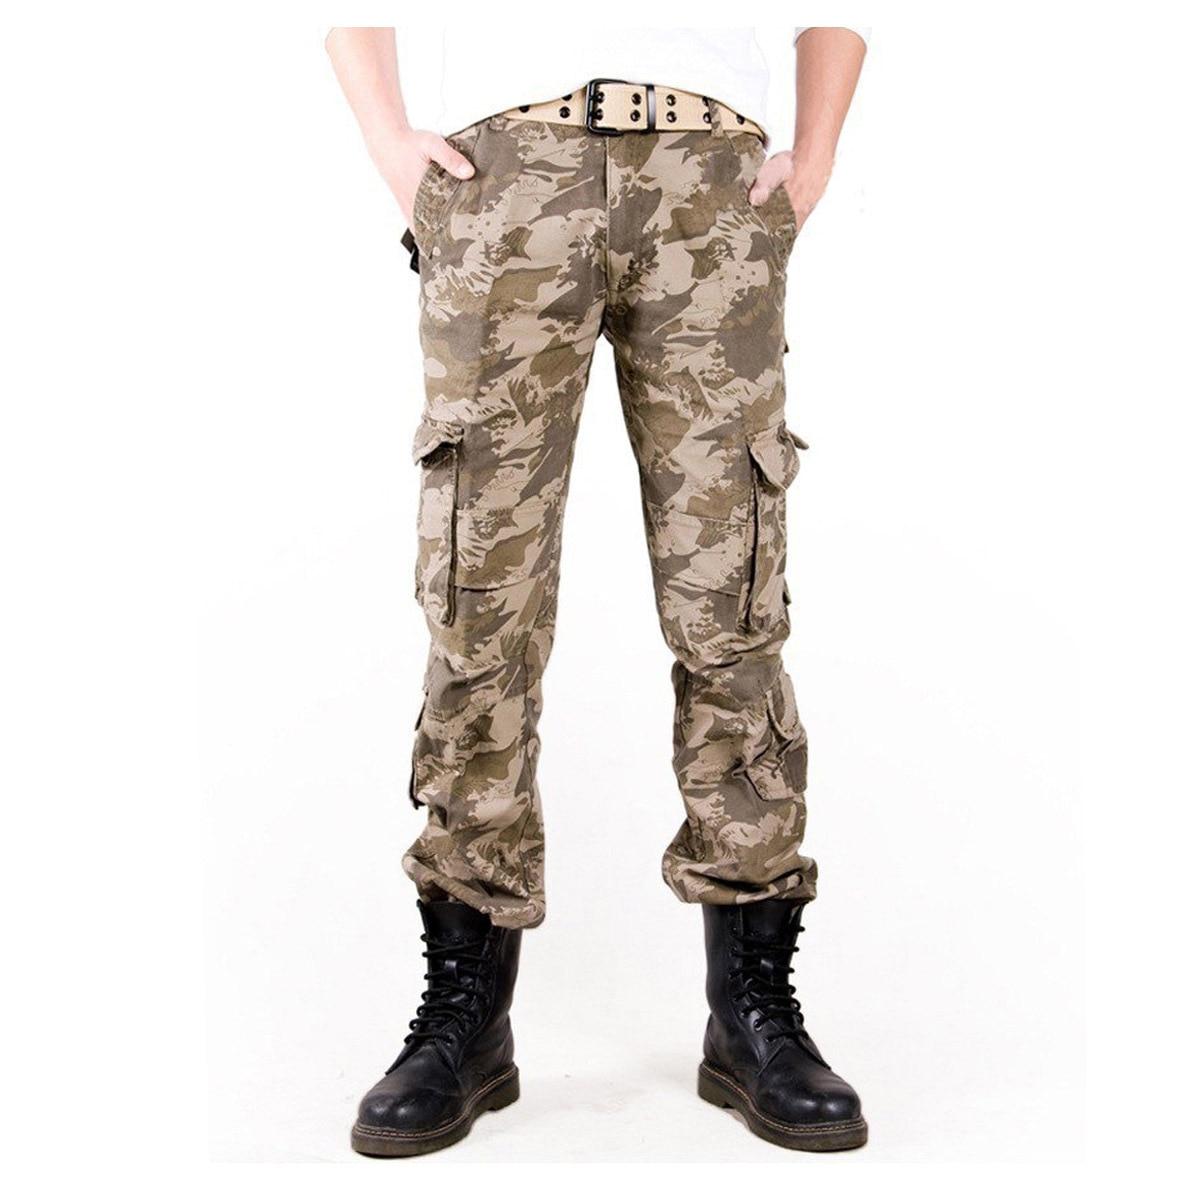 2017 hombre foto Real Outwear hombres pantalones de camuflaje moda Multi bolsillos militar ejército pantalones Joggers Camo Baggy Cargo Pantalones - 3